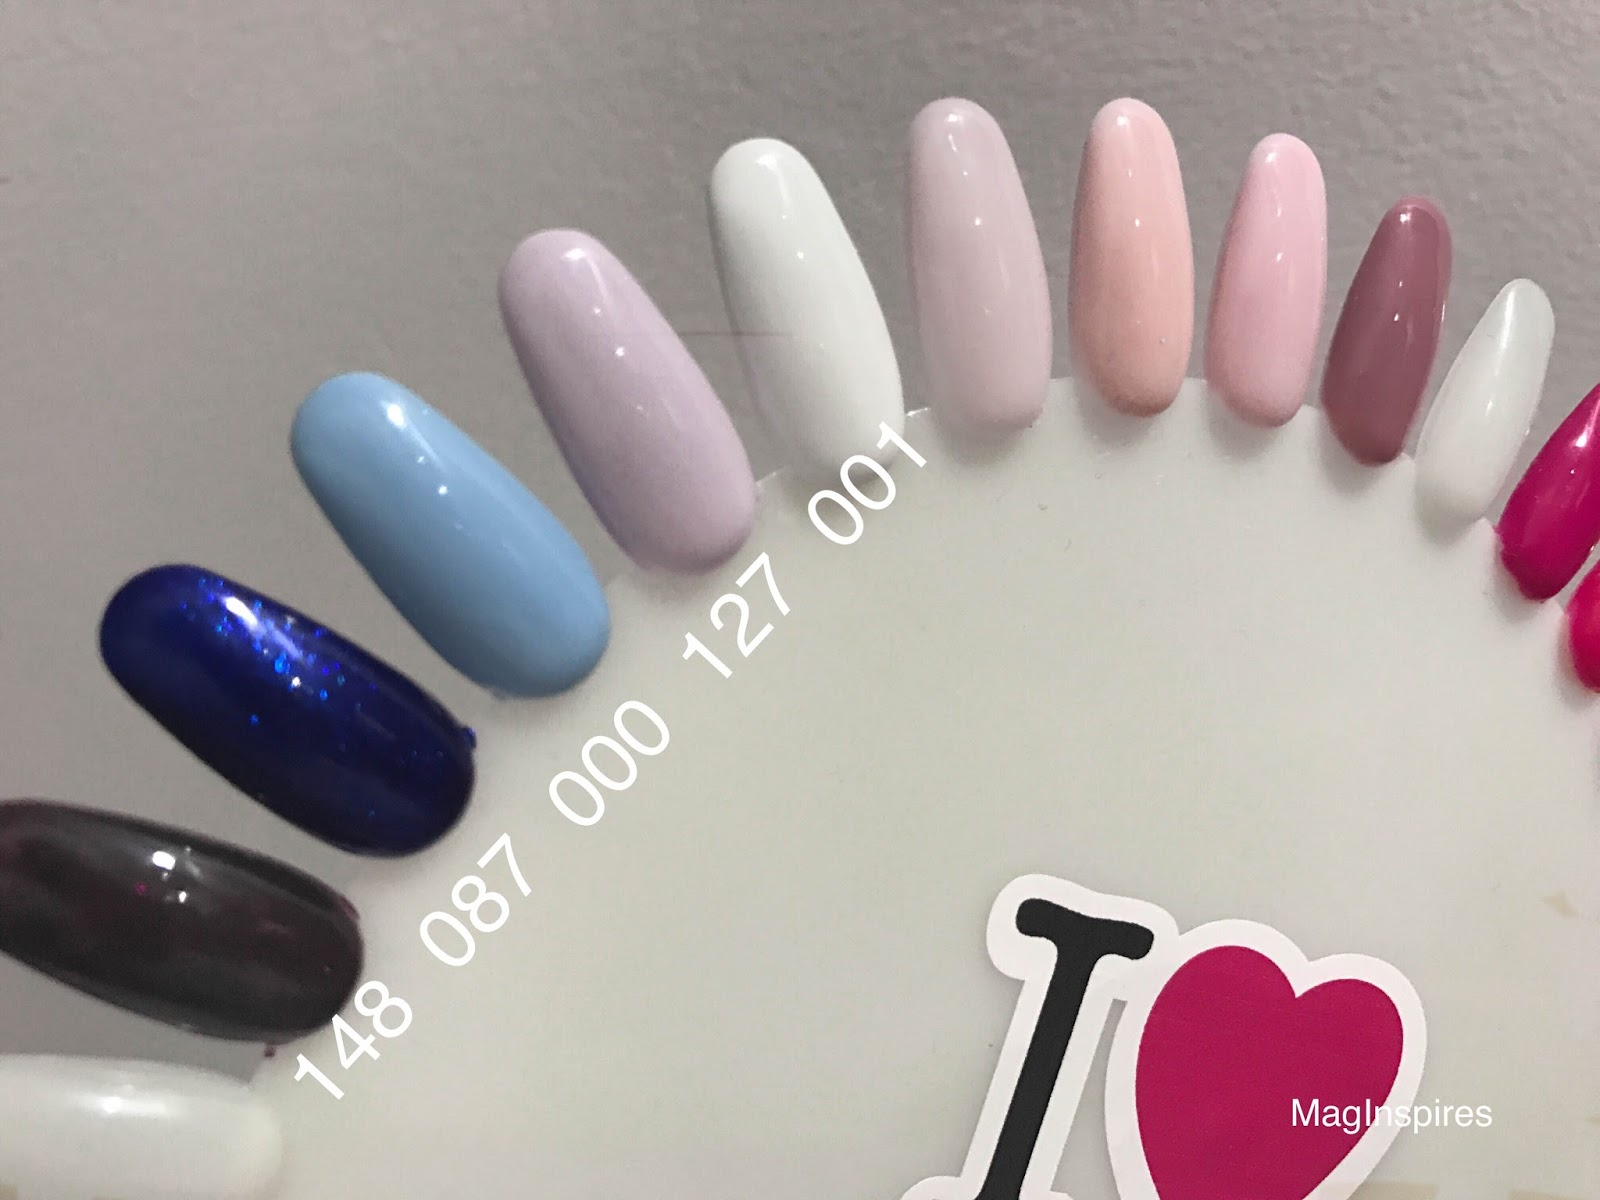 Maginspires Beauty Blog Semilac Moje Kolory Lakierow Hybrydowych